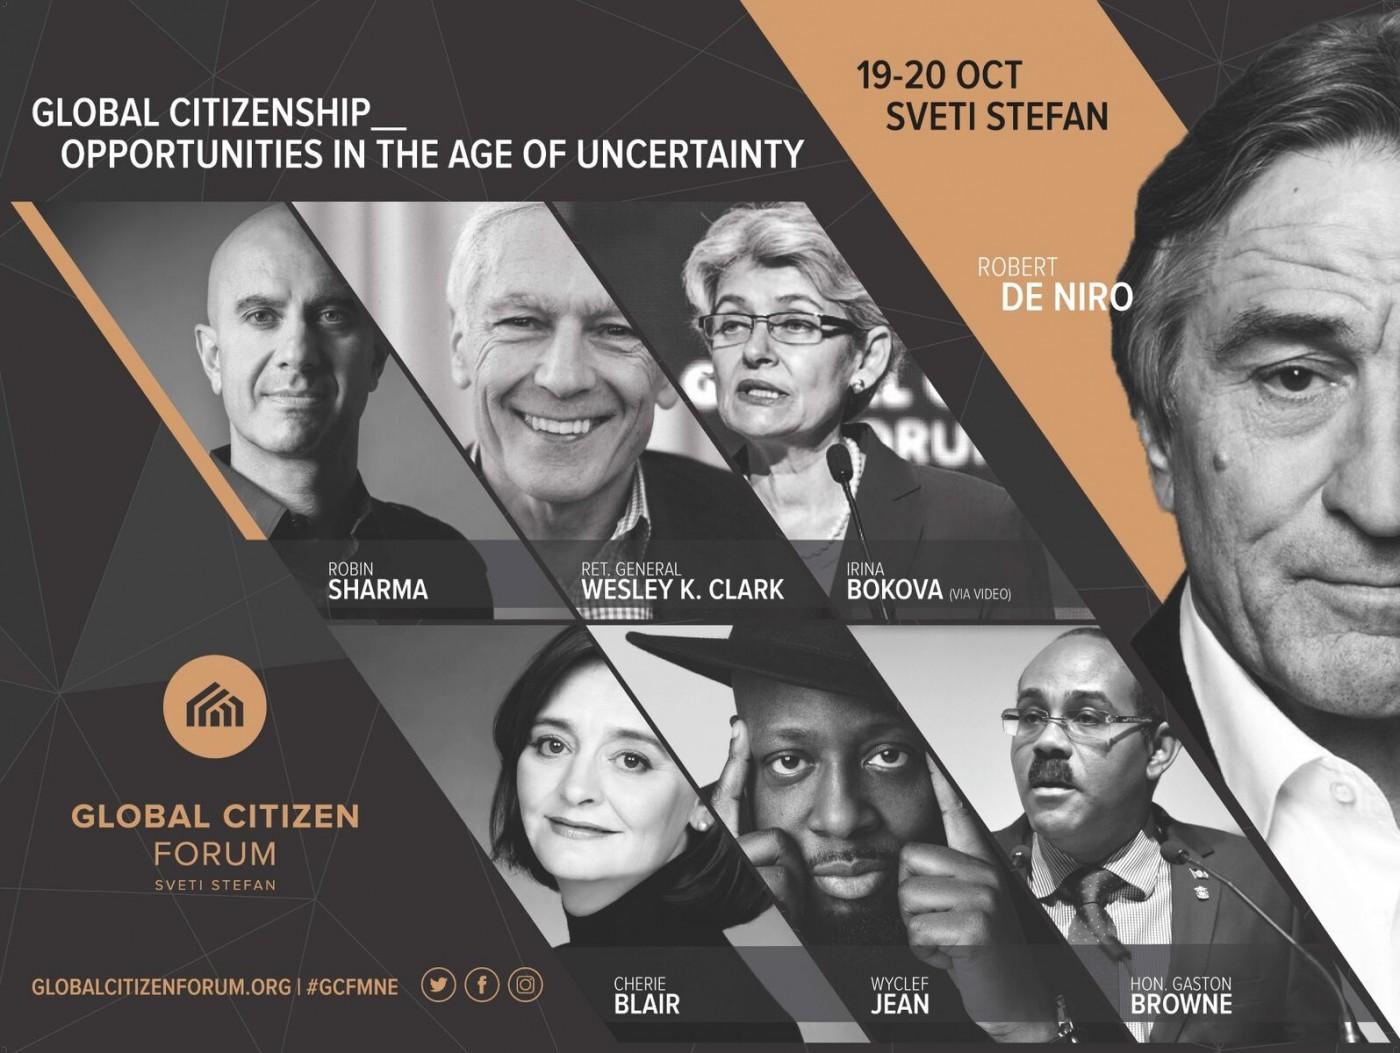 Световни лидери и звезди на Global Citizen Forum